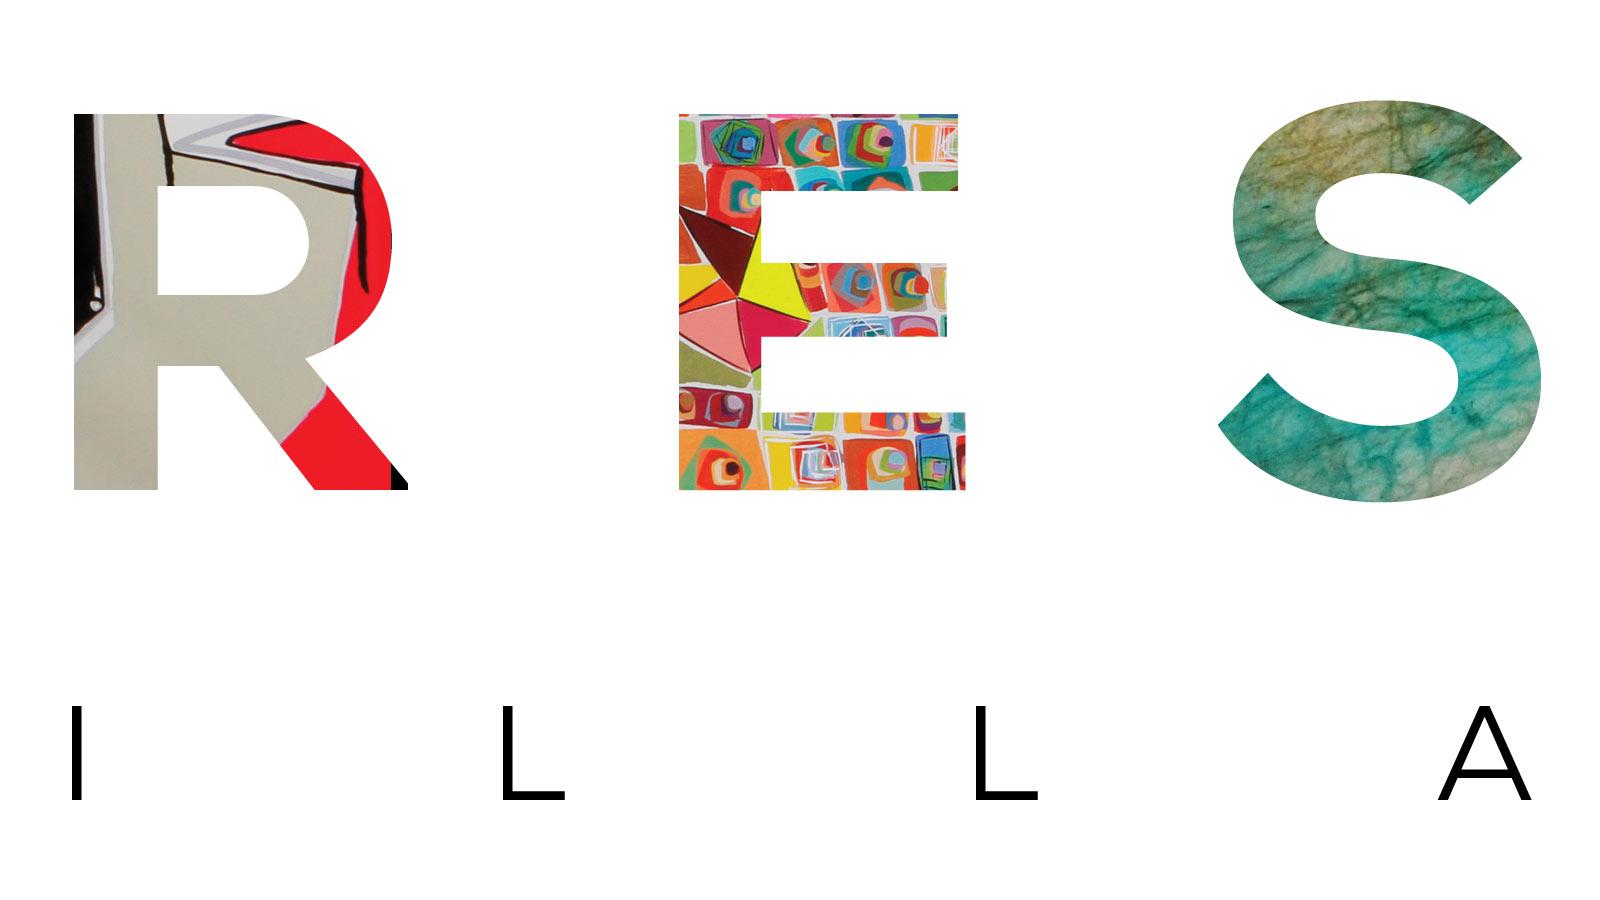 De Colores Baranquilla logo